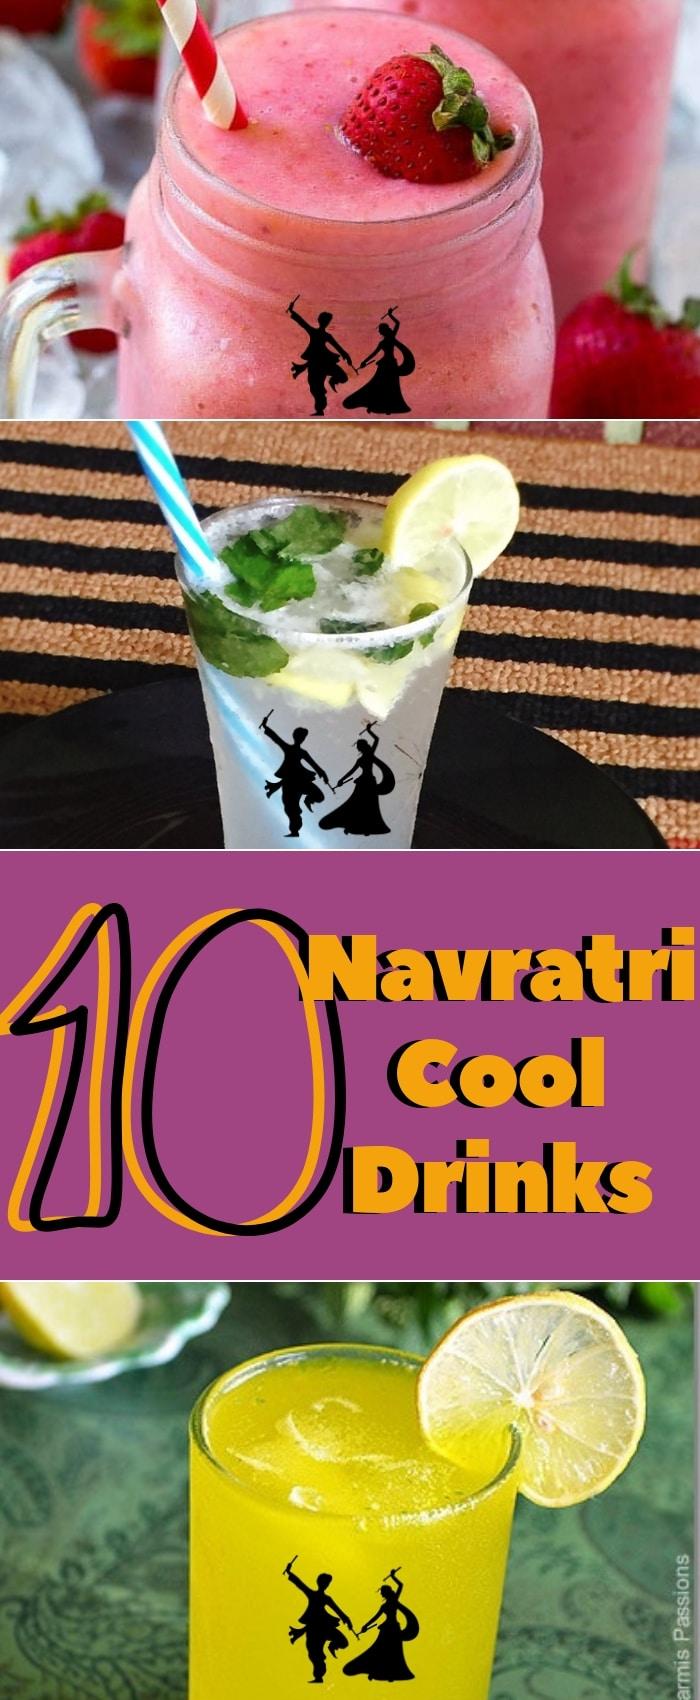 10 Refreshing Drinks